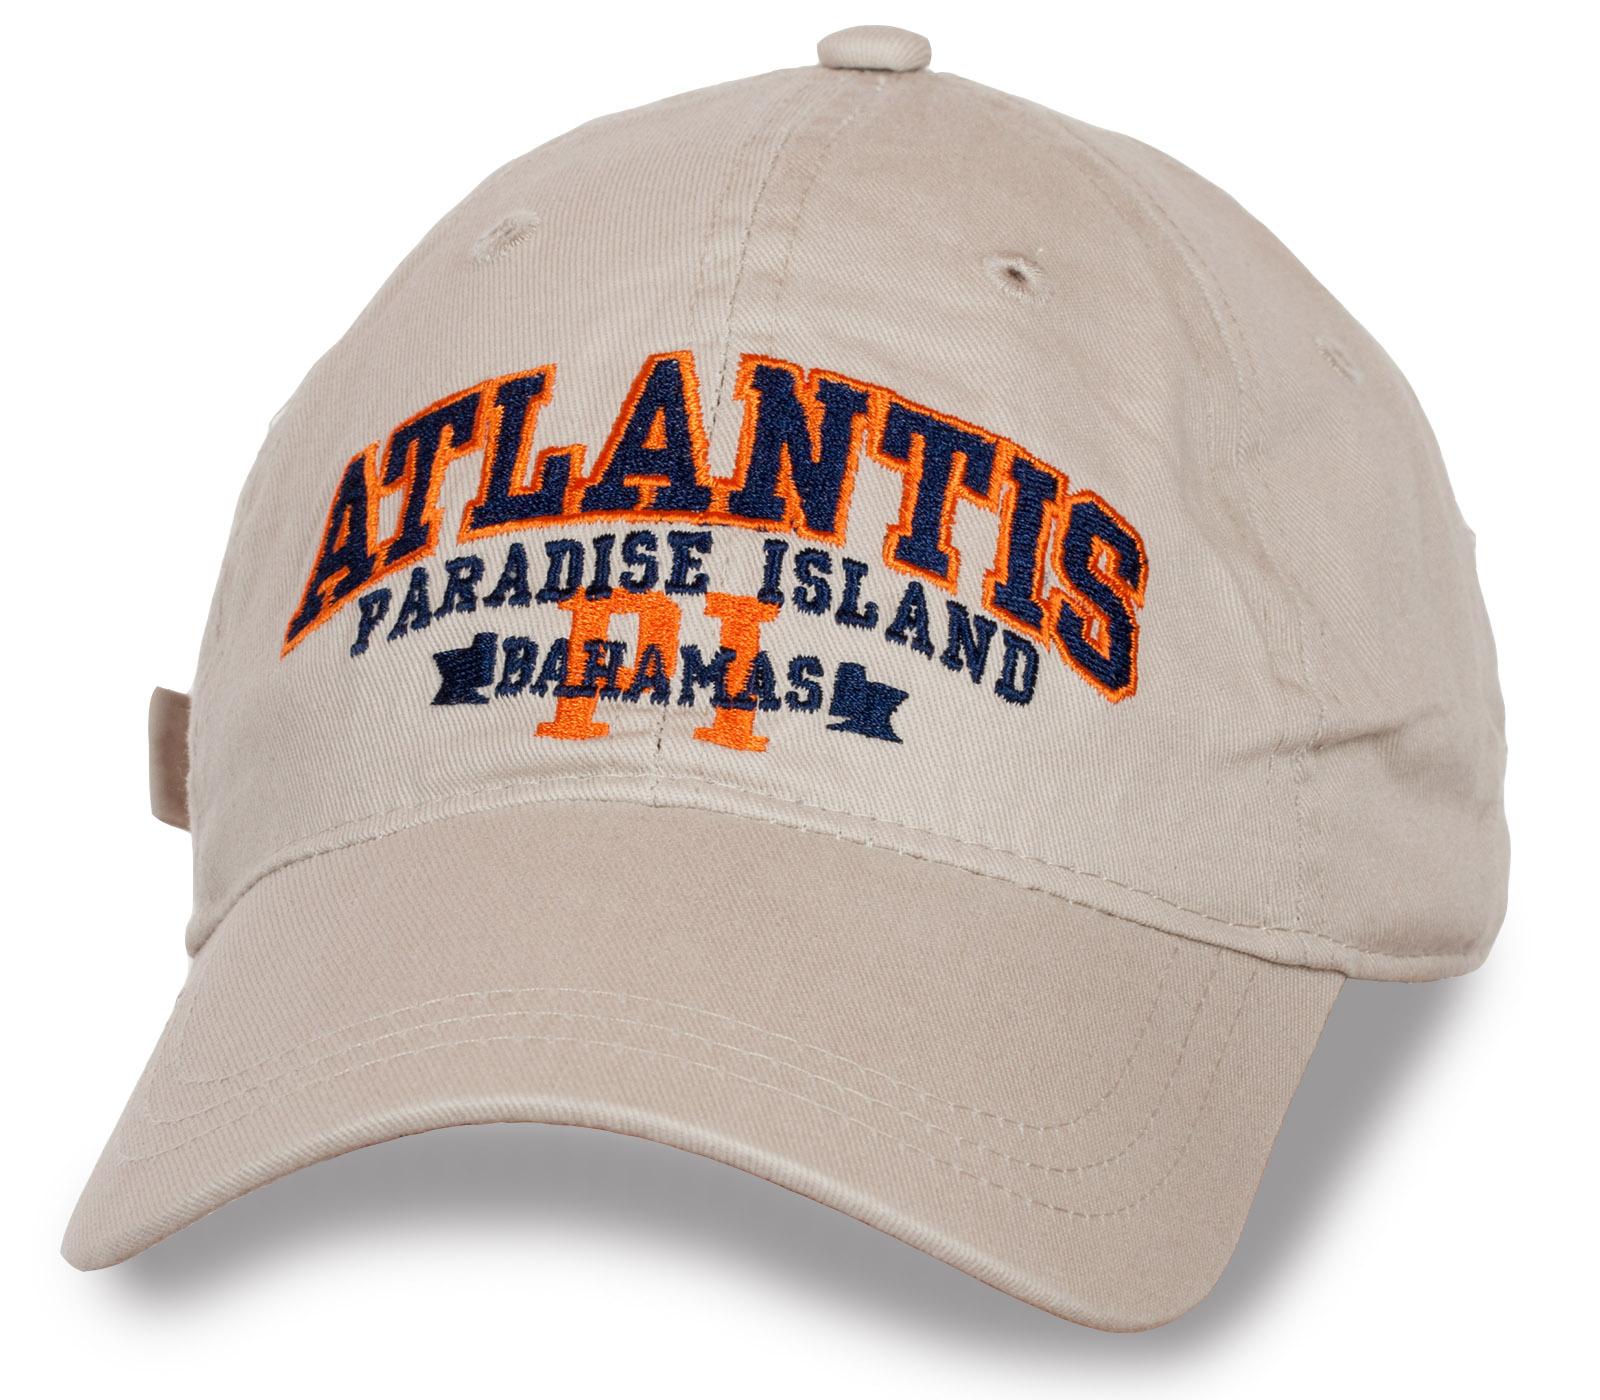 Бежевая кепка ATLANTIS PARADISE ISLAND.